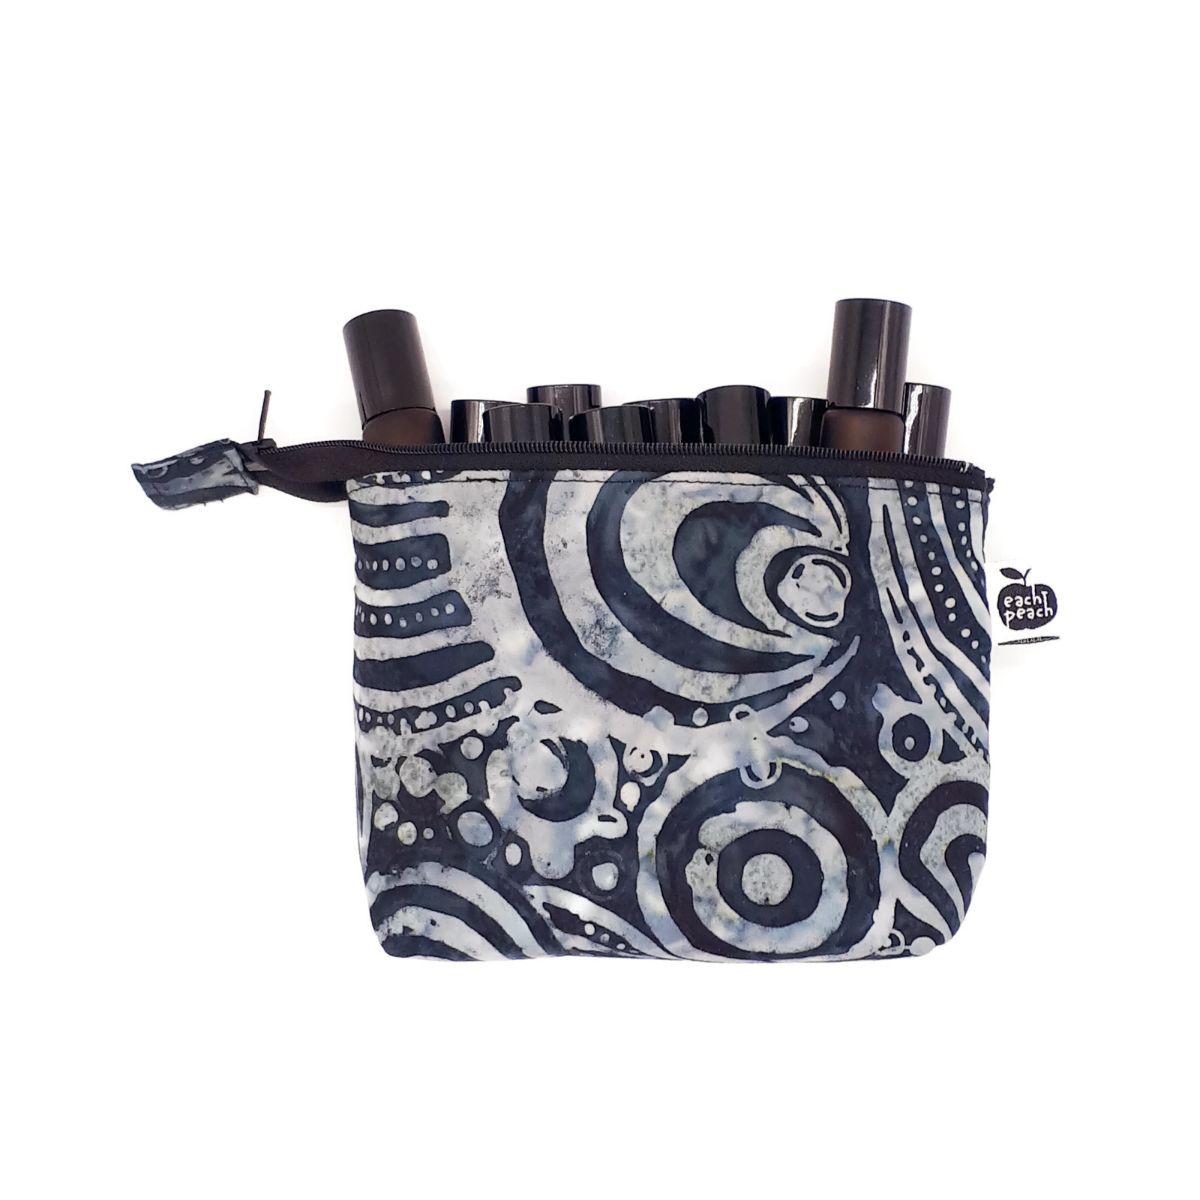 doterra-convention-bag-black-swirls